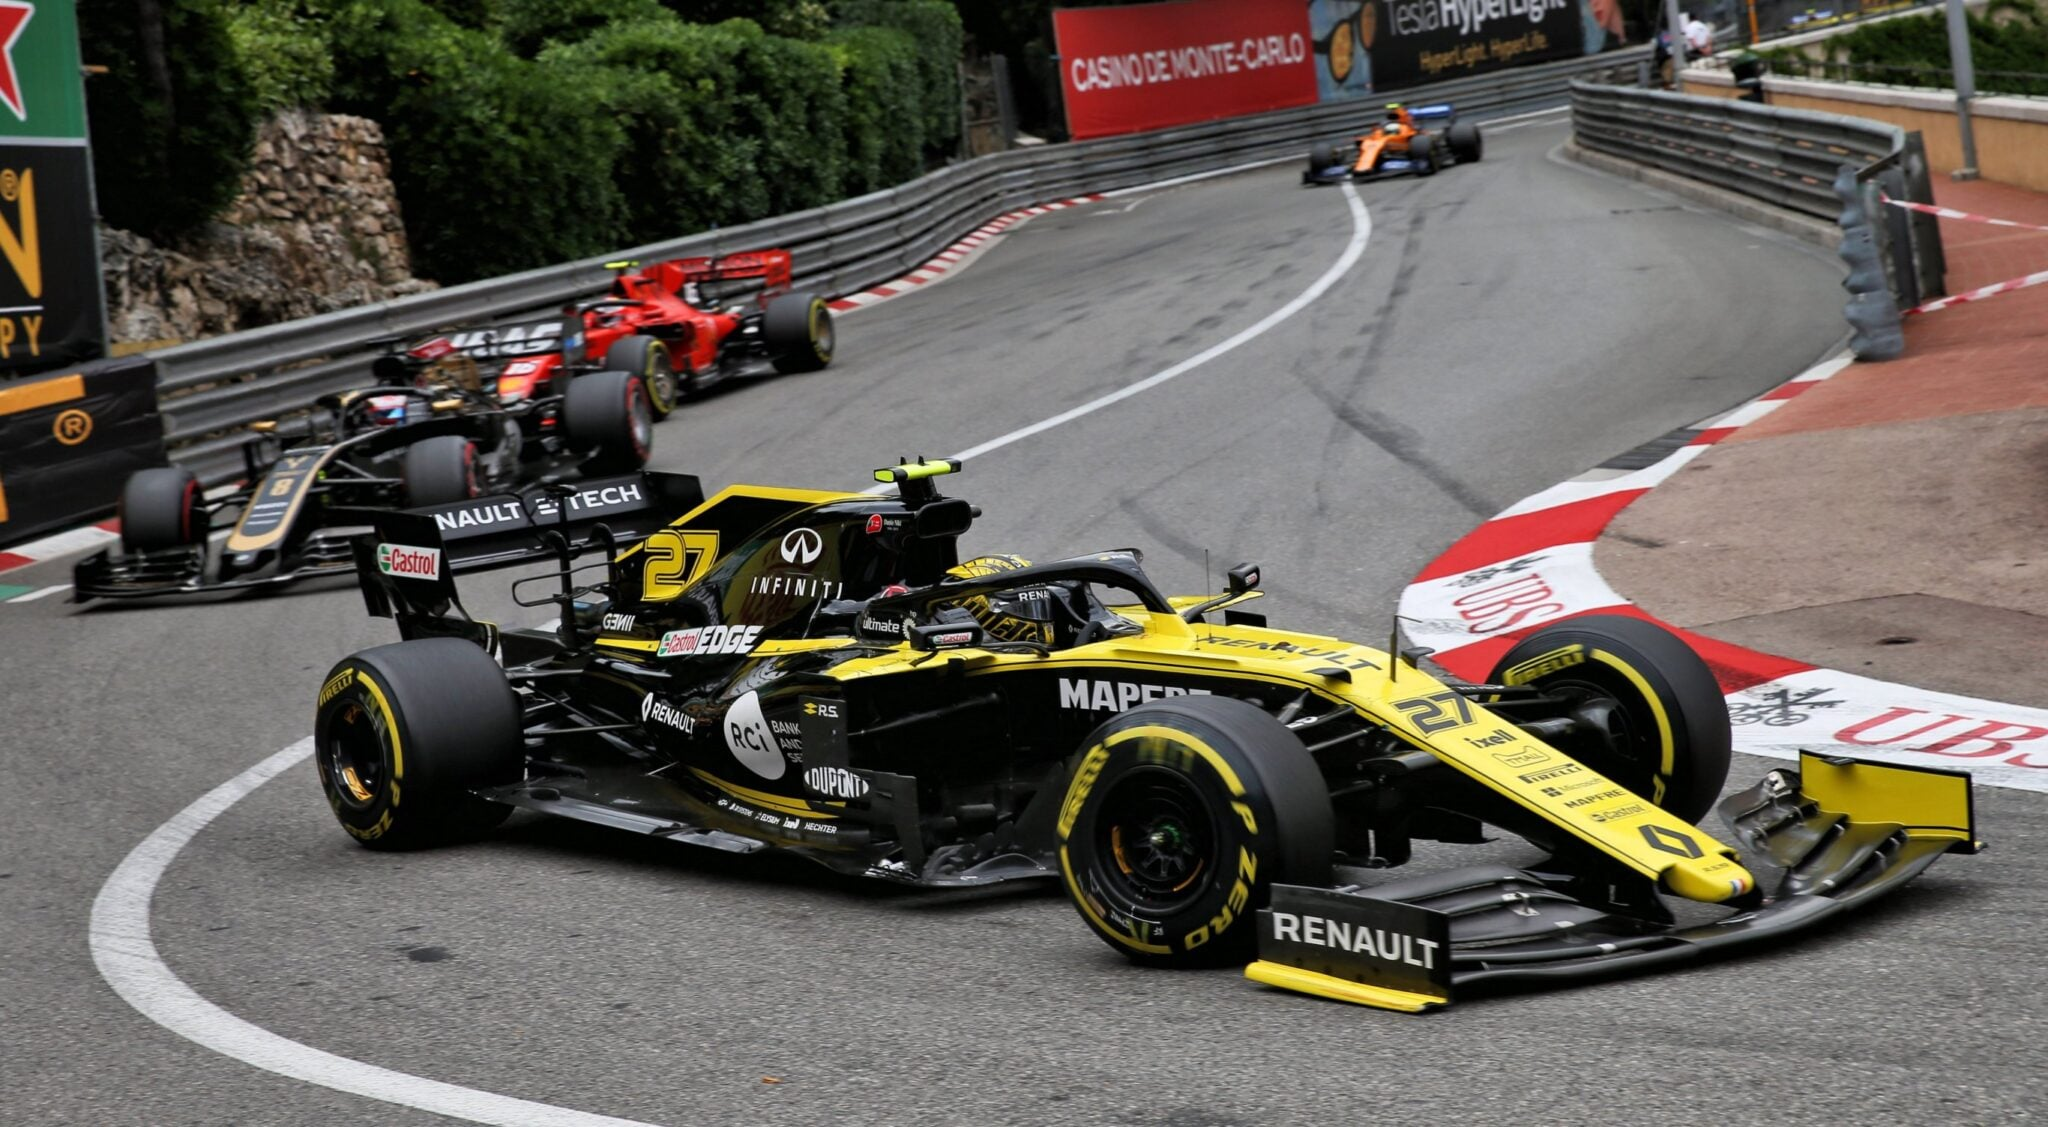 Alpine F1 Monaco GP 2021